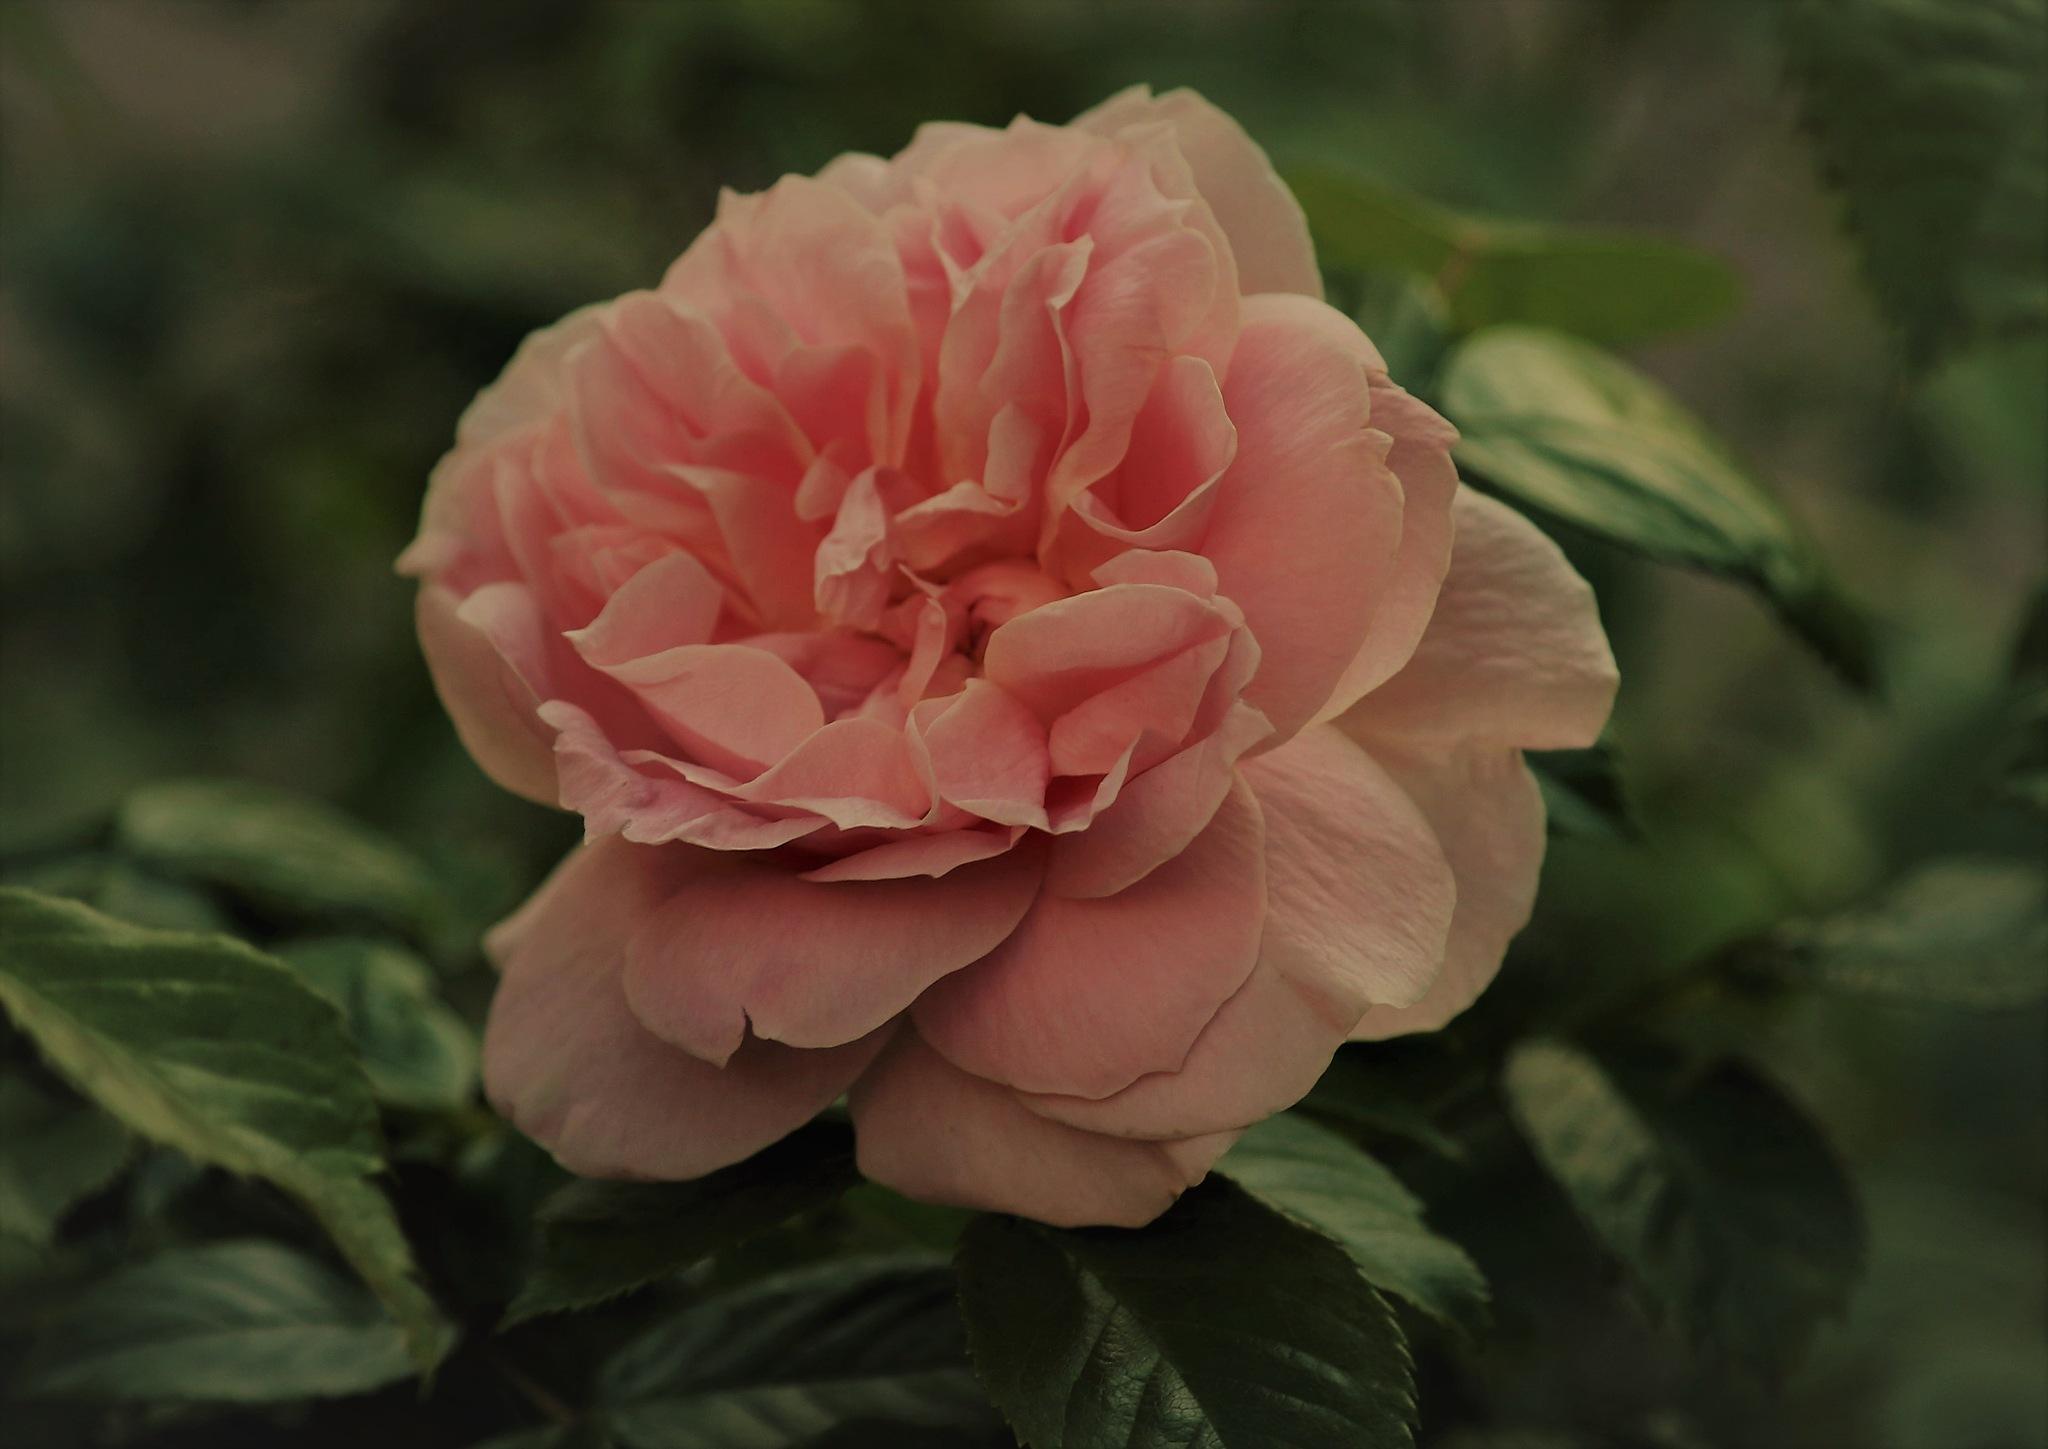 Rose in the Summernigh. by KerstinP.